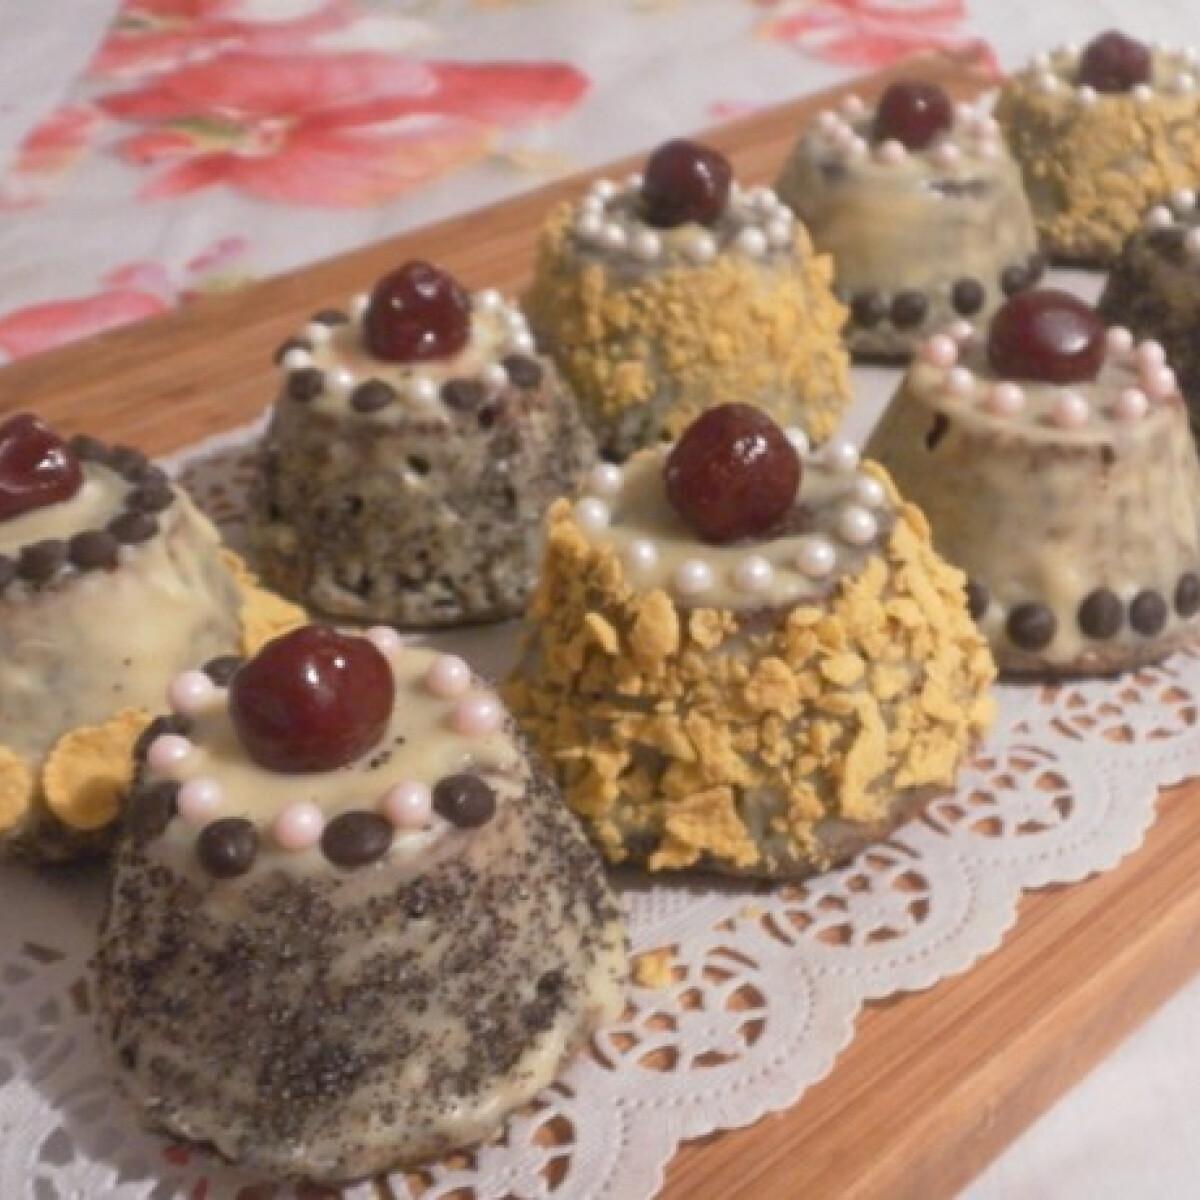 Mákos muffintortácskák